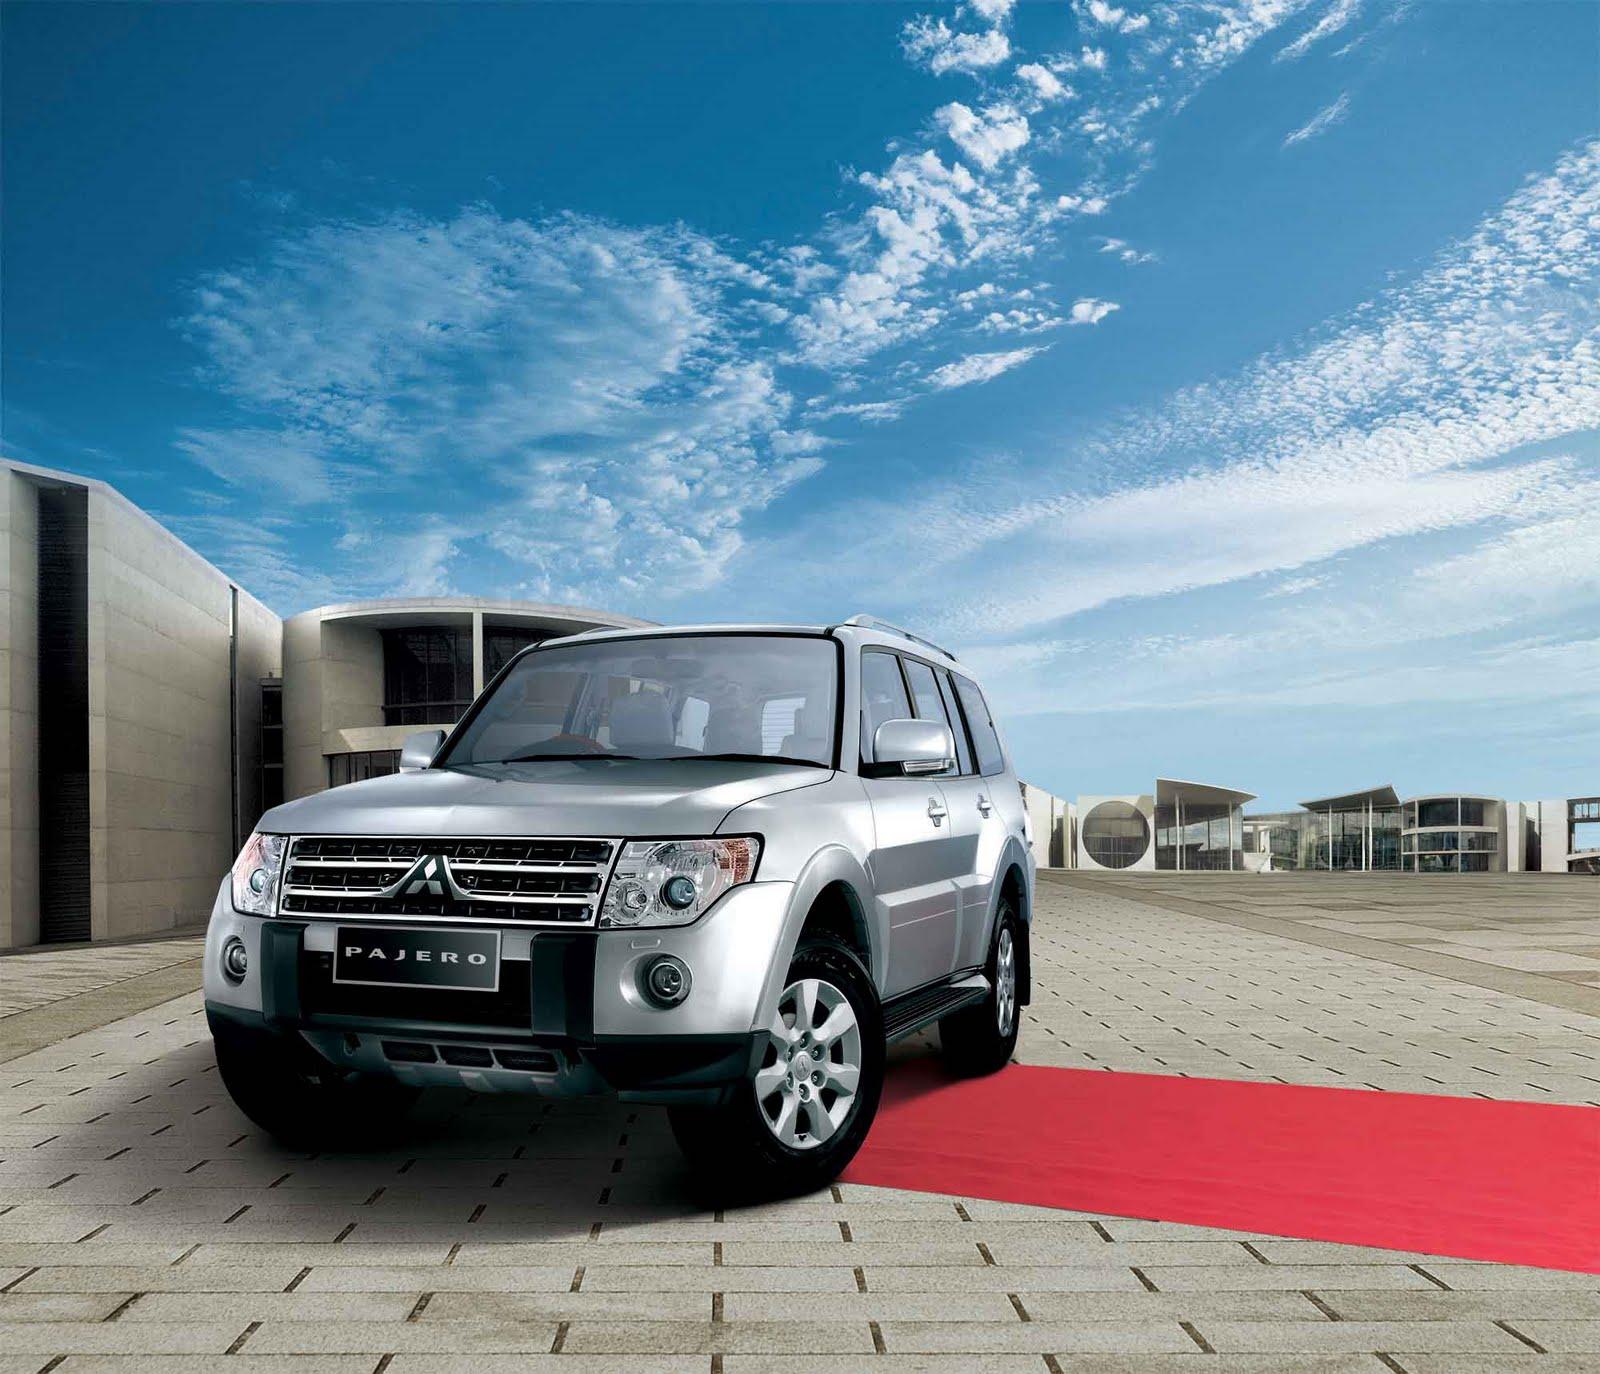 Mitsubishi Pajero Wallpapers: Car Barn Sport: Pajero Super Exceed